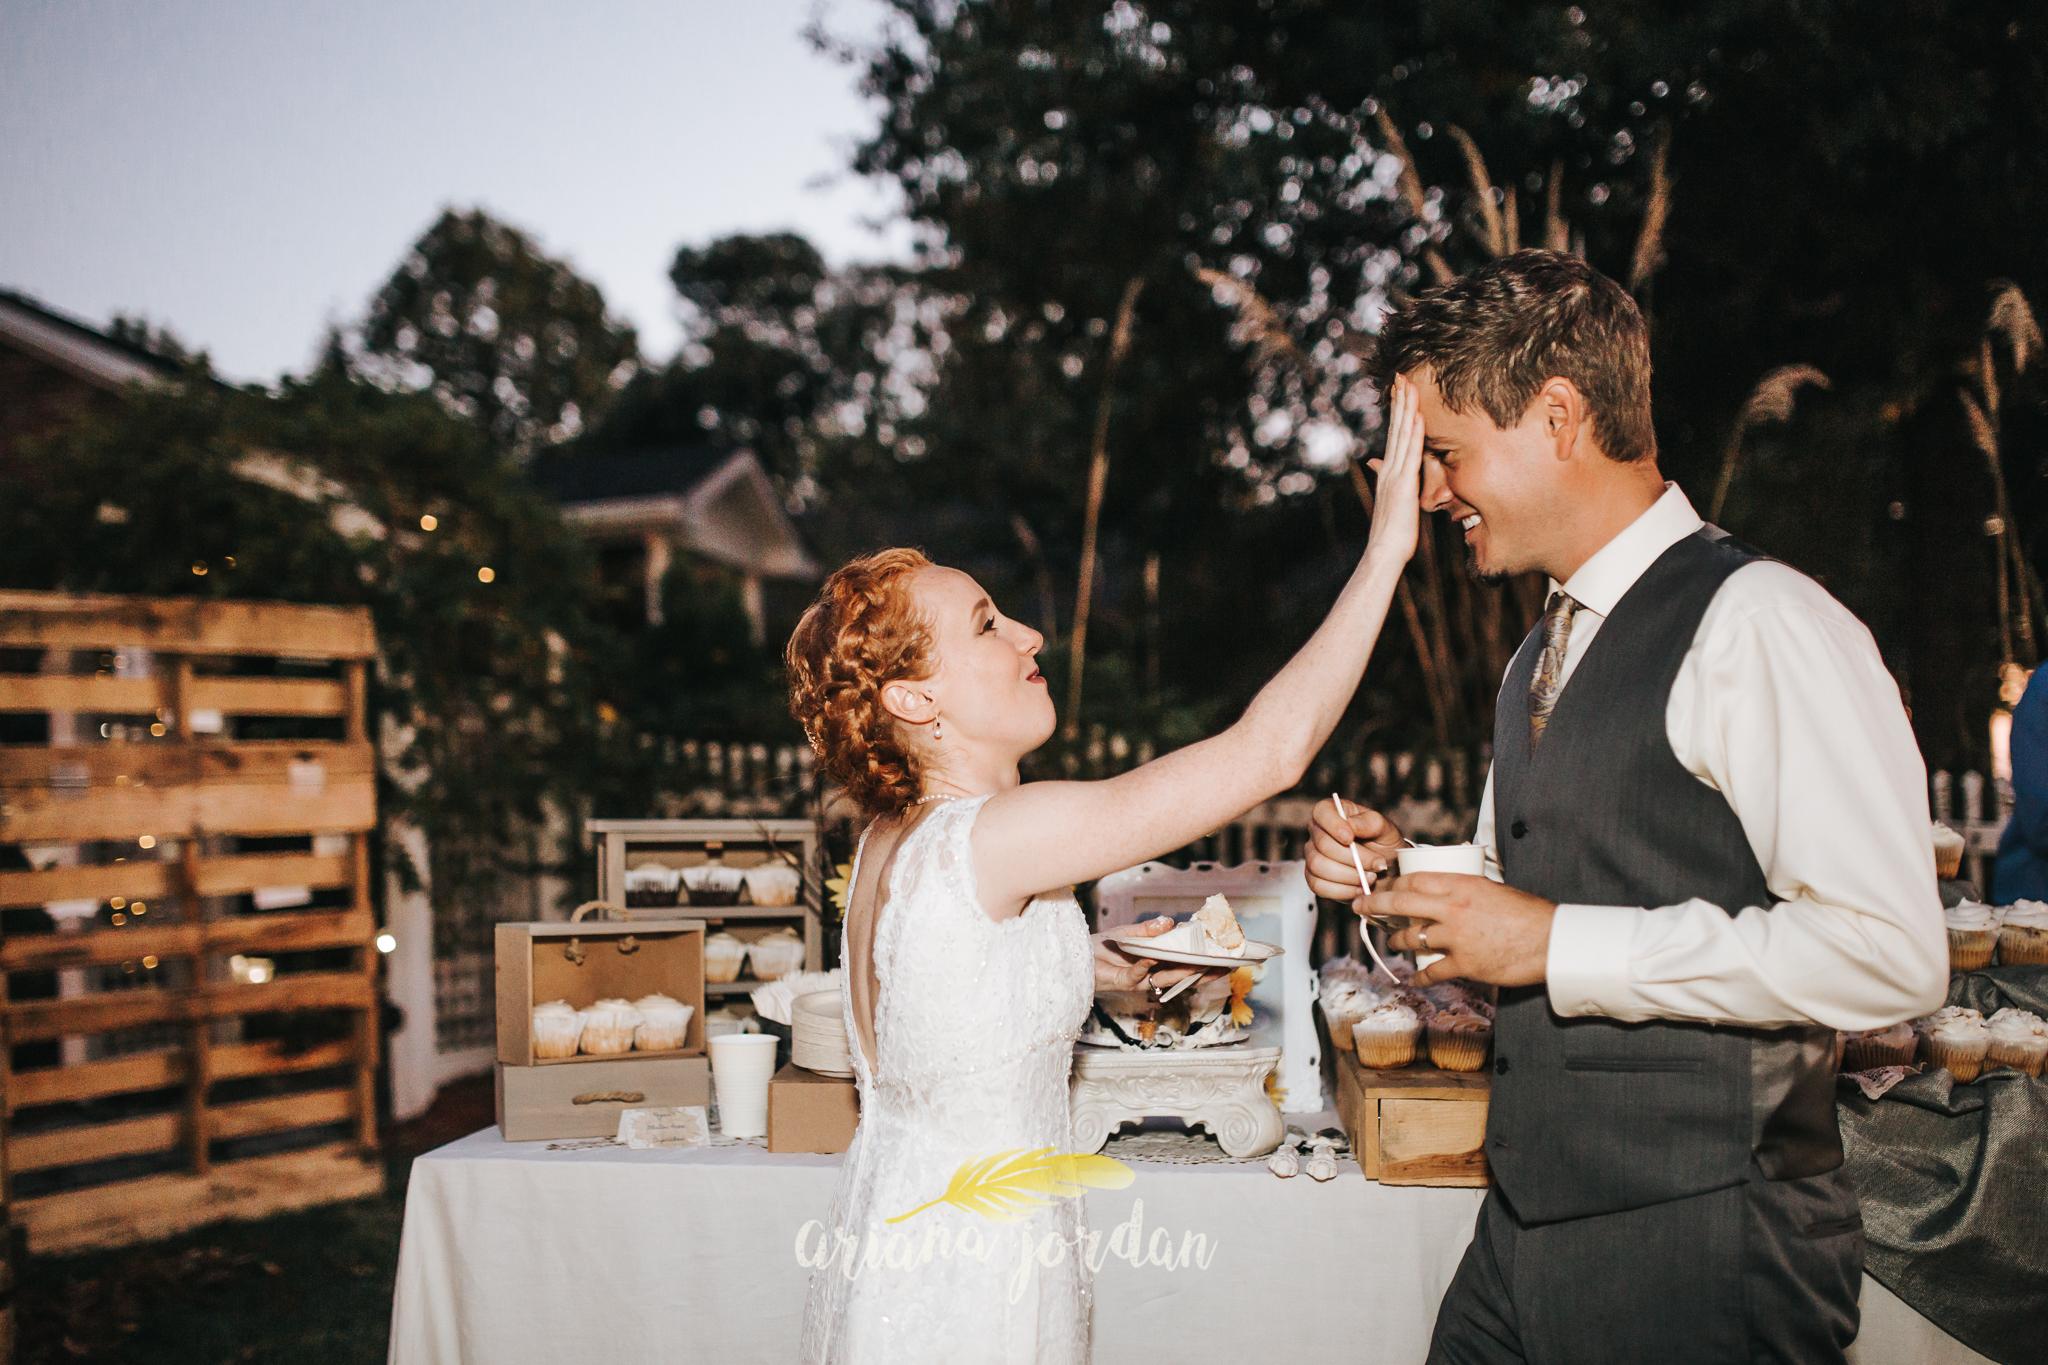 146 Ariana Jordan Photography -Moonlight Fields Lexington Ky Wedding Photographer 2229.jpg